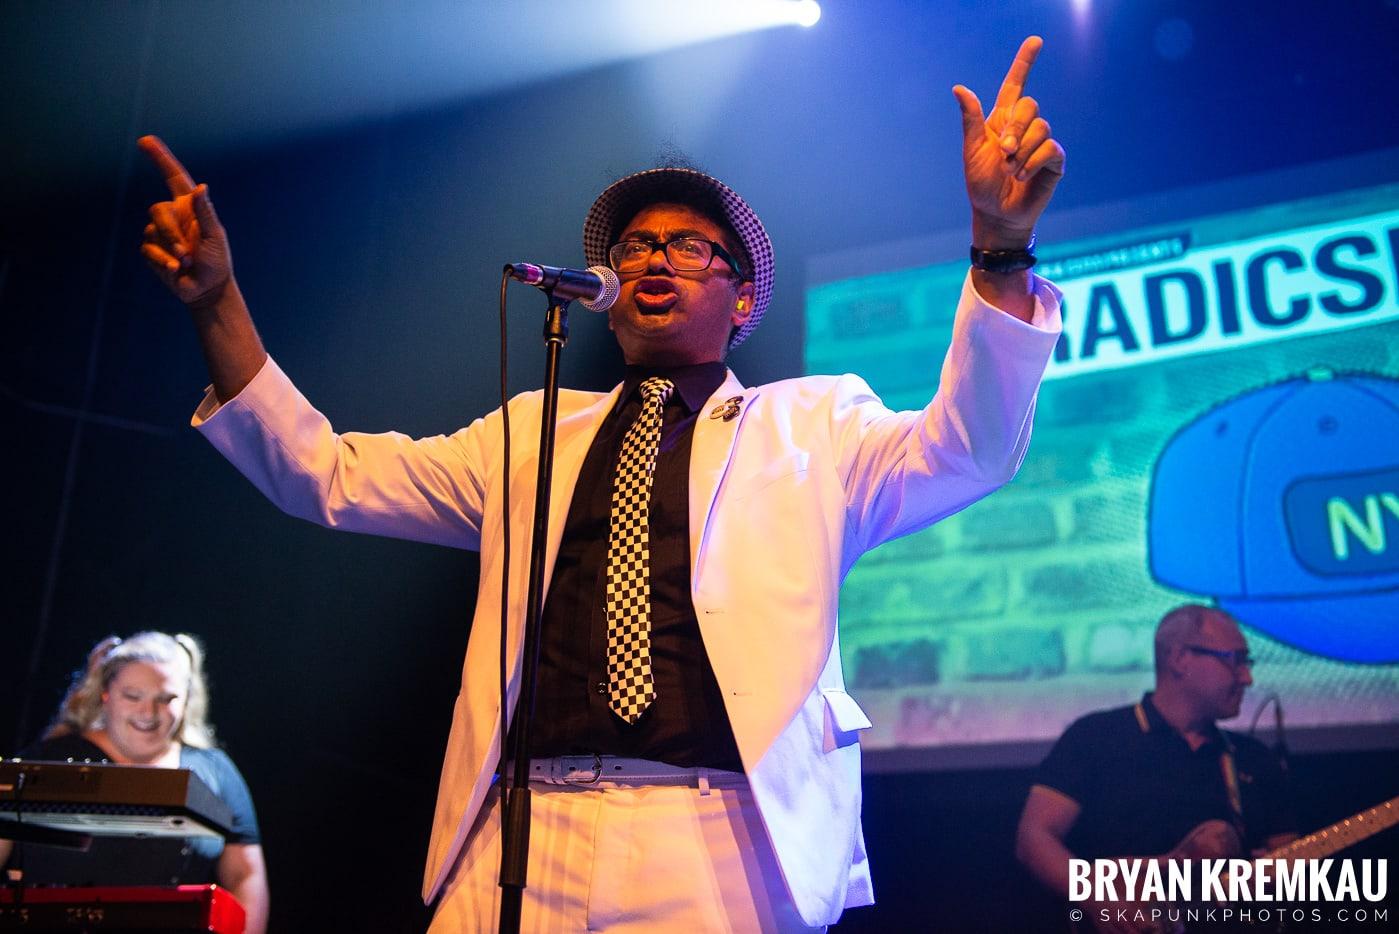 Rude Boy George @ Radicsfest, Gramercy Theatre, NYC - 7.19.19 (71)